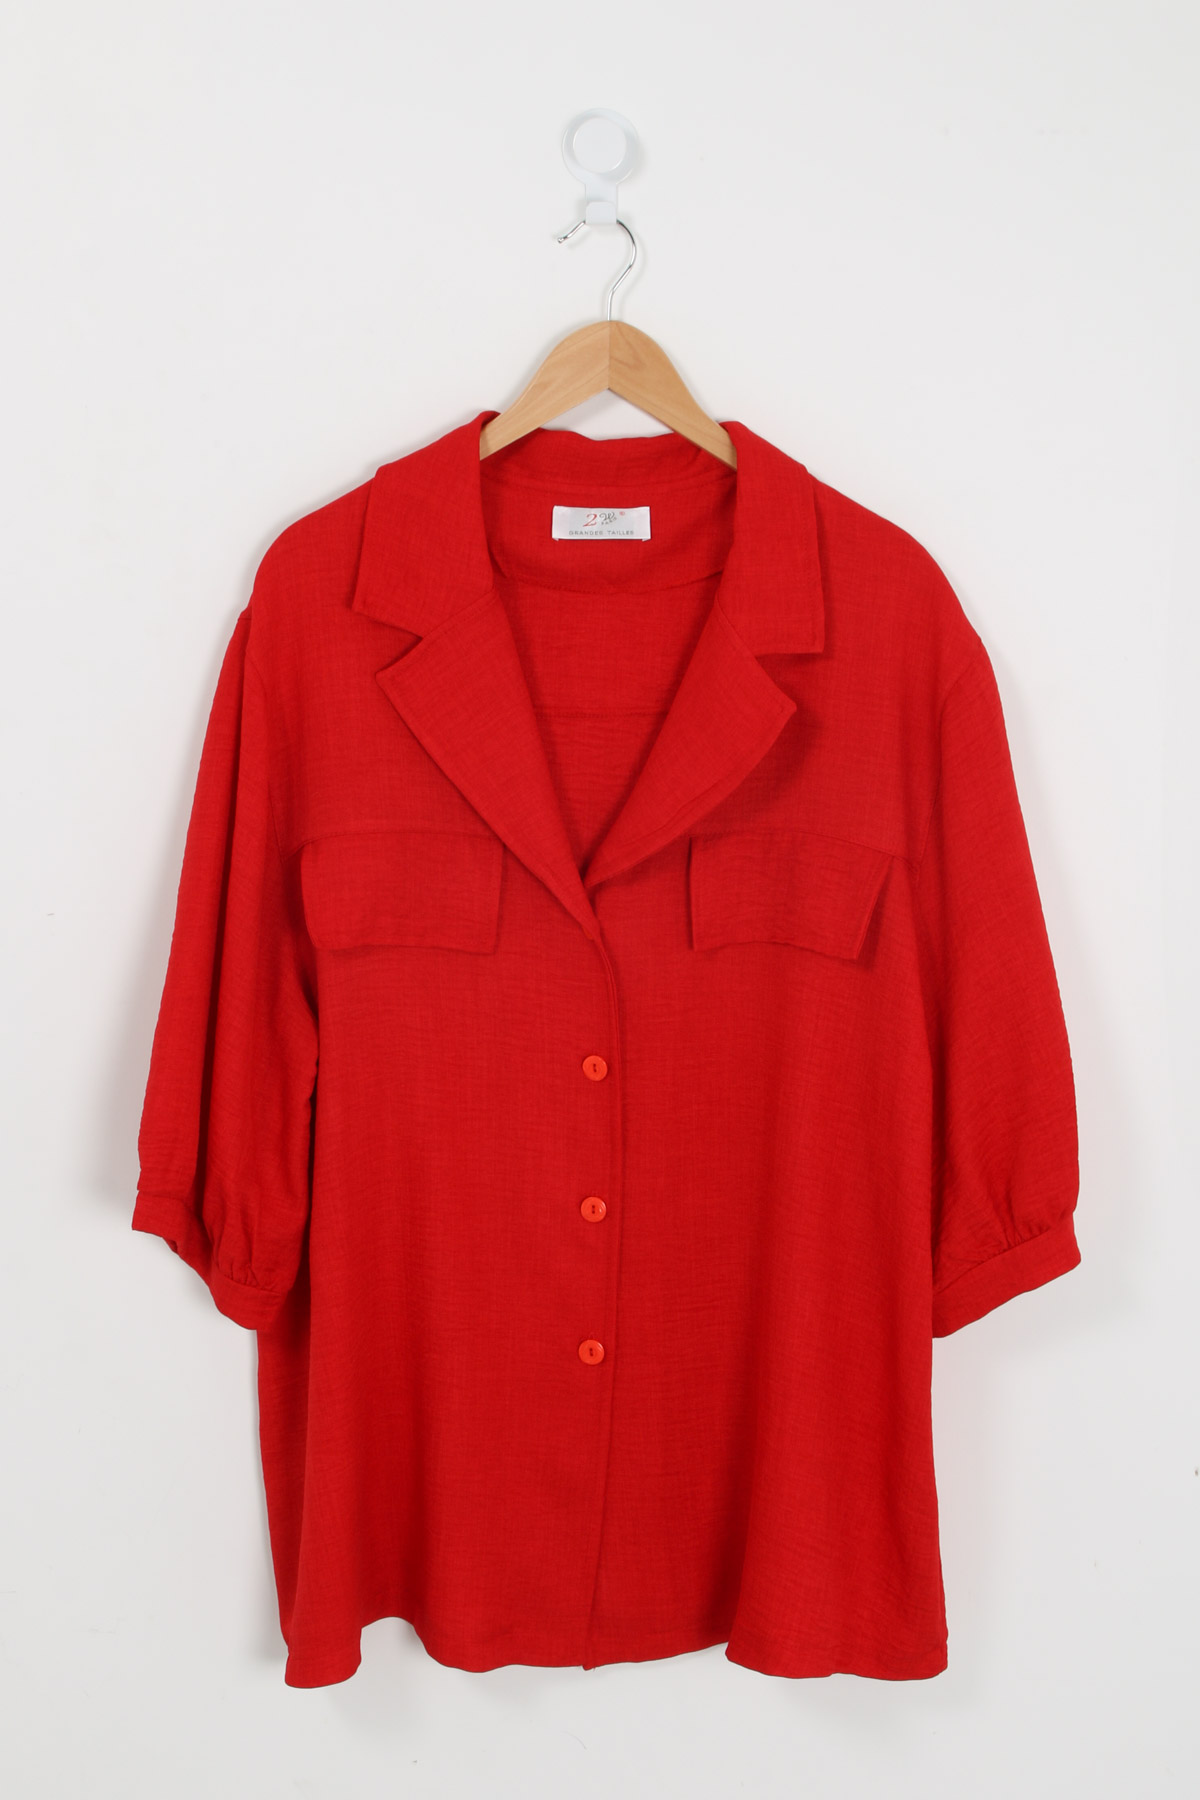 chemise grande taille femme 2W PARIS c1321 rouge 46-60